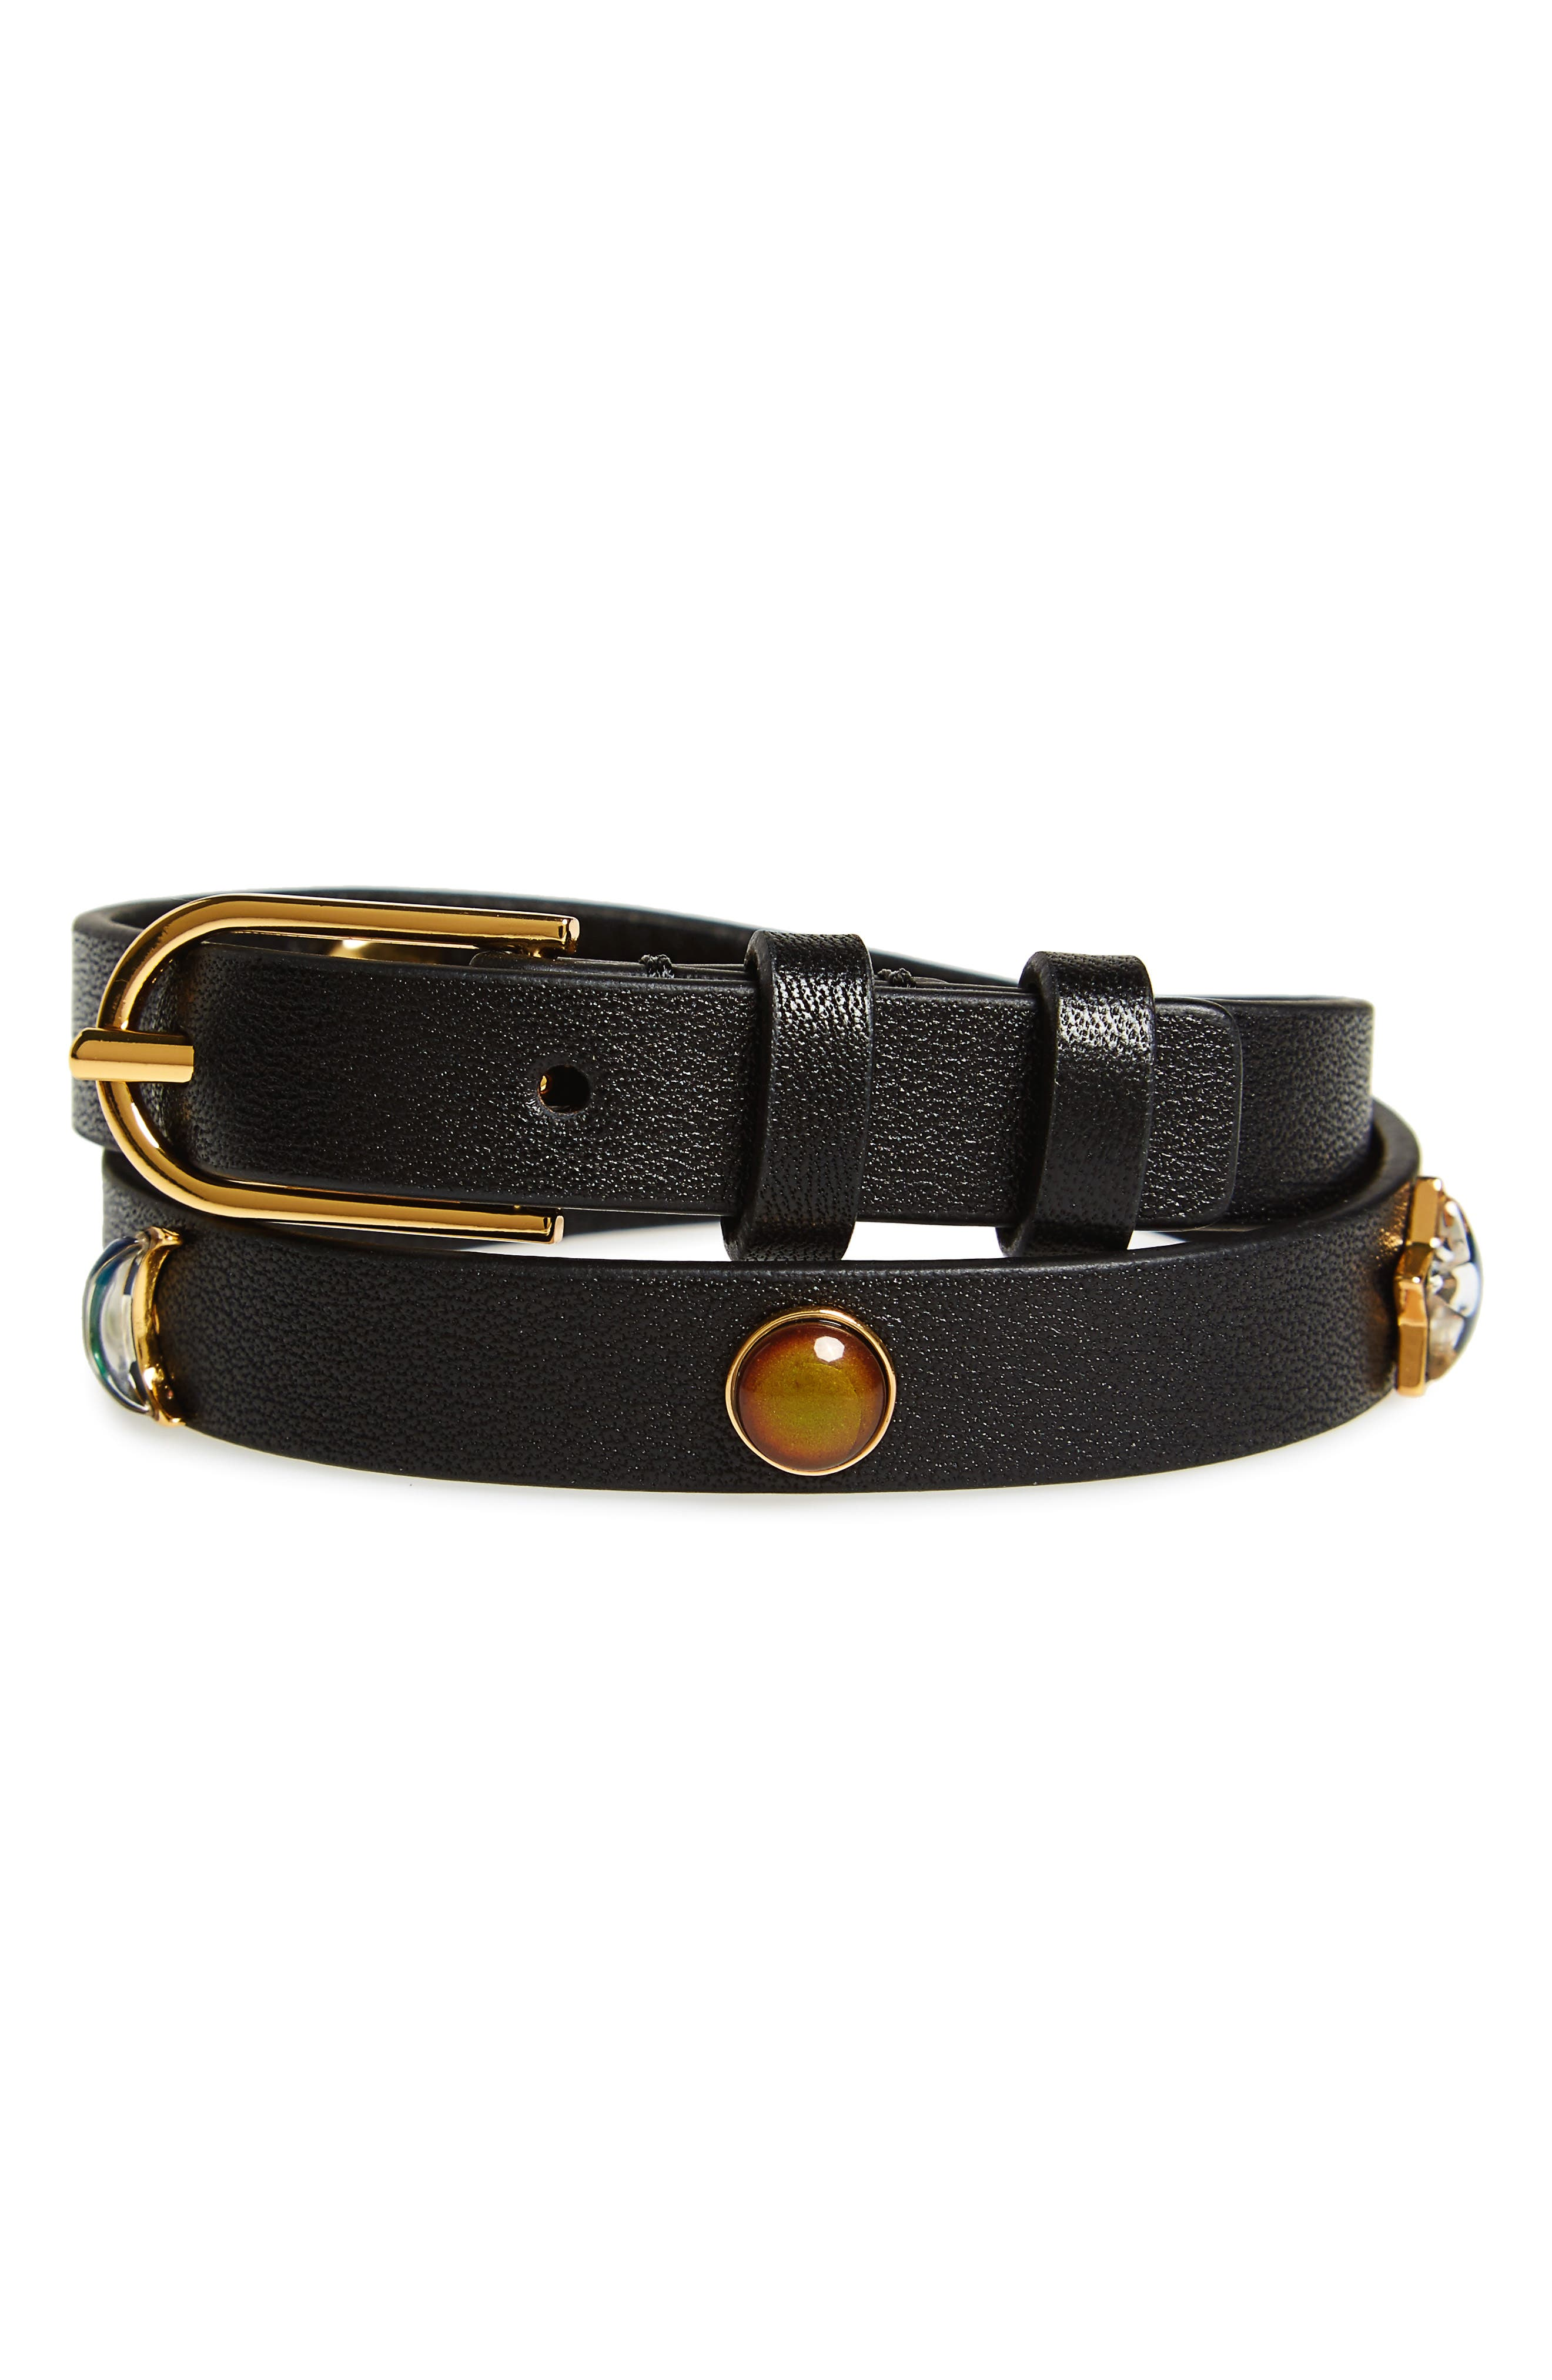 Tory Burch Moonstone Embellished Wrap Bracelet